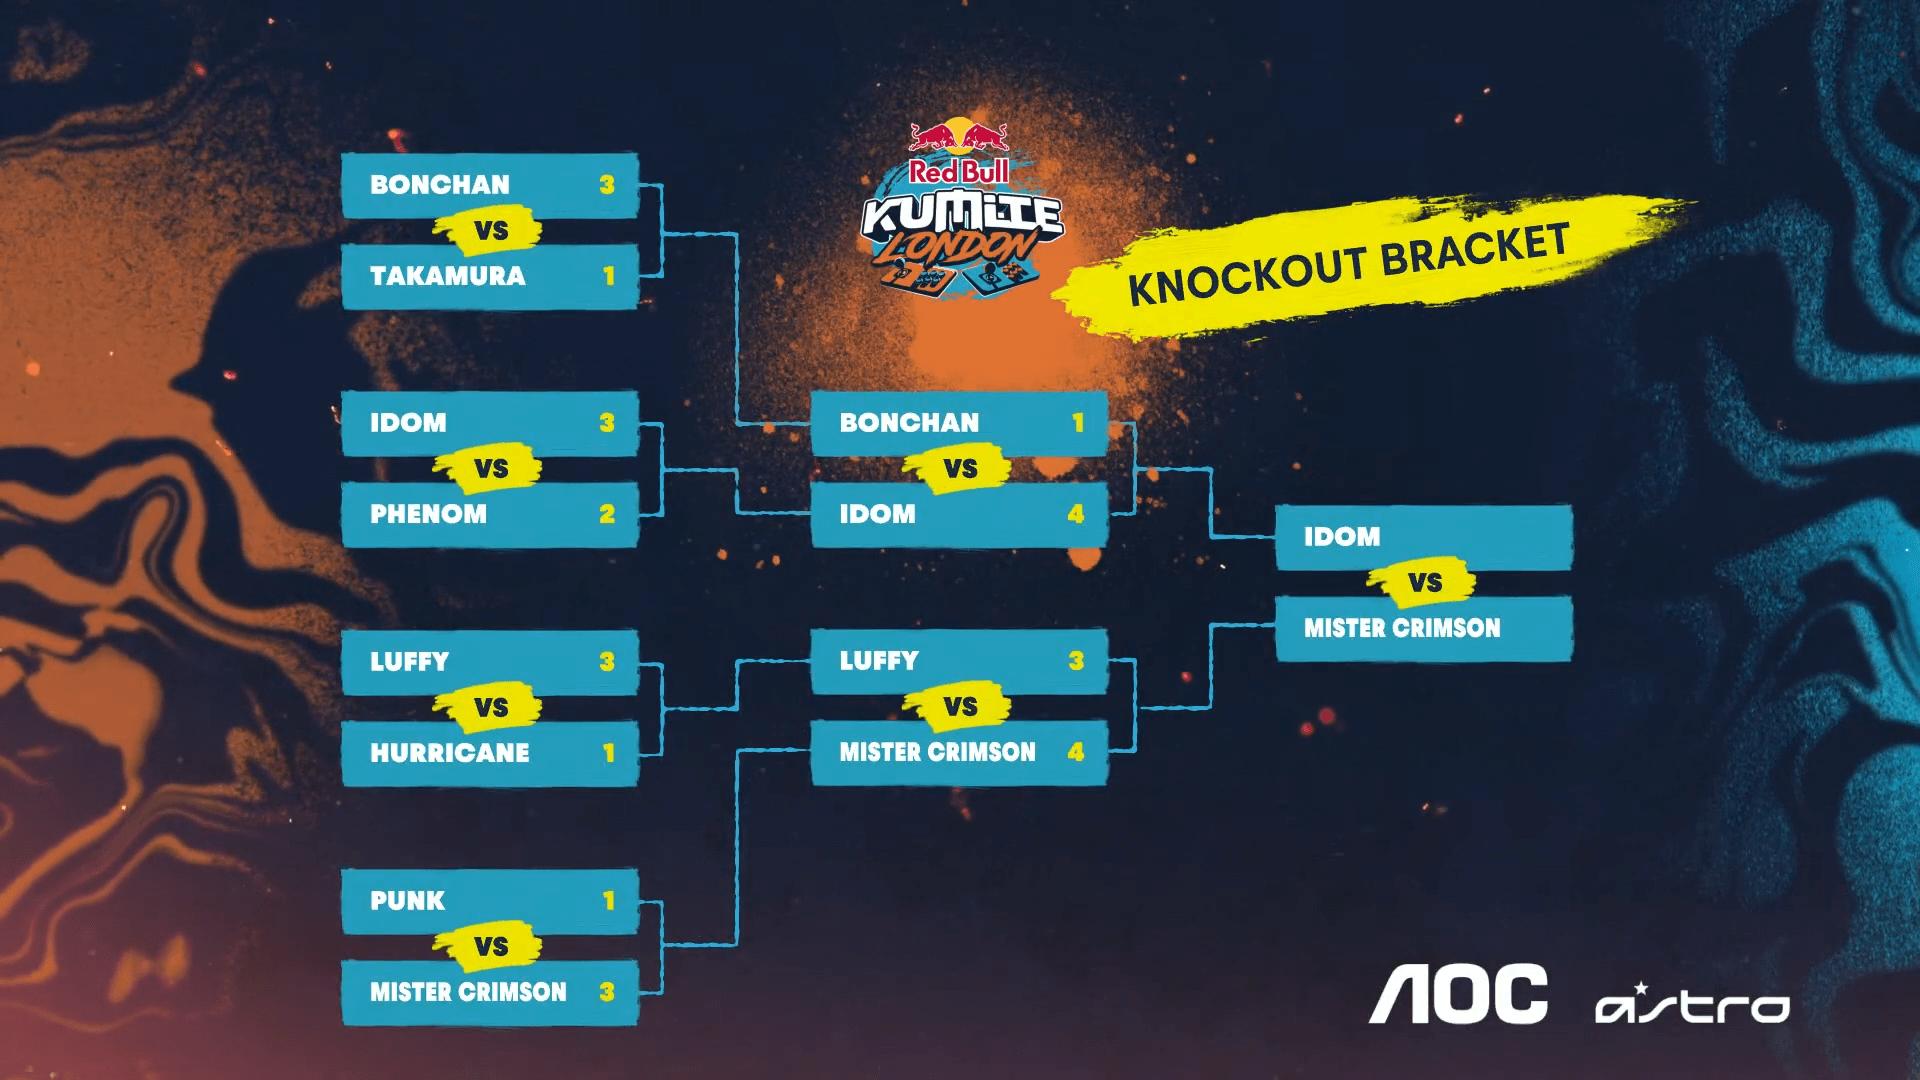 Red Bull Kumite London - SFV esports - playoff brackets, results till the final